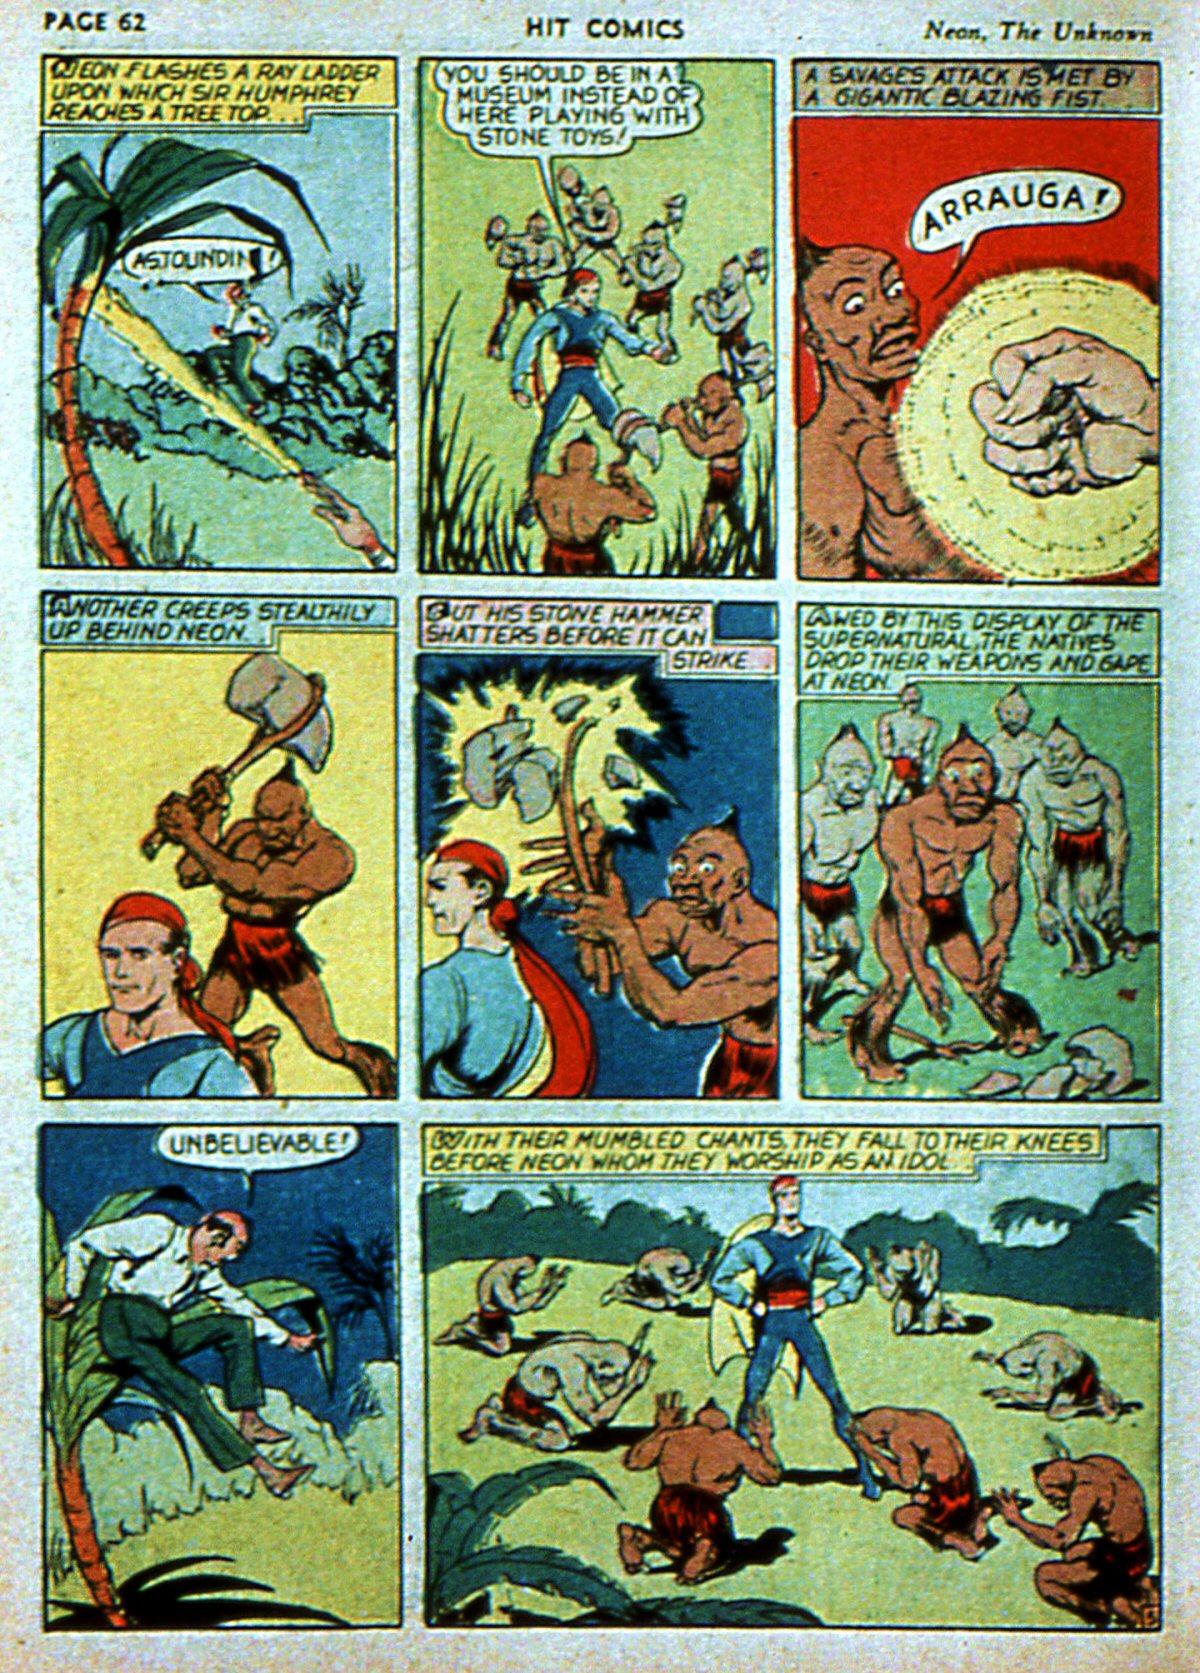 Read online Hit Comics comic -  Issue #3 - 64